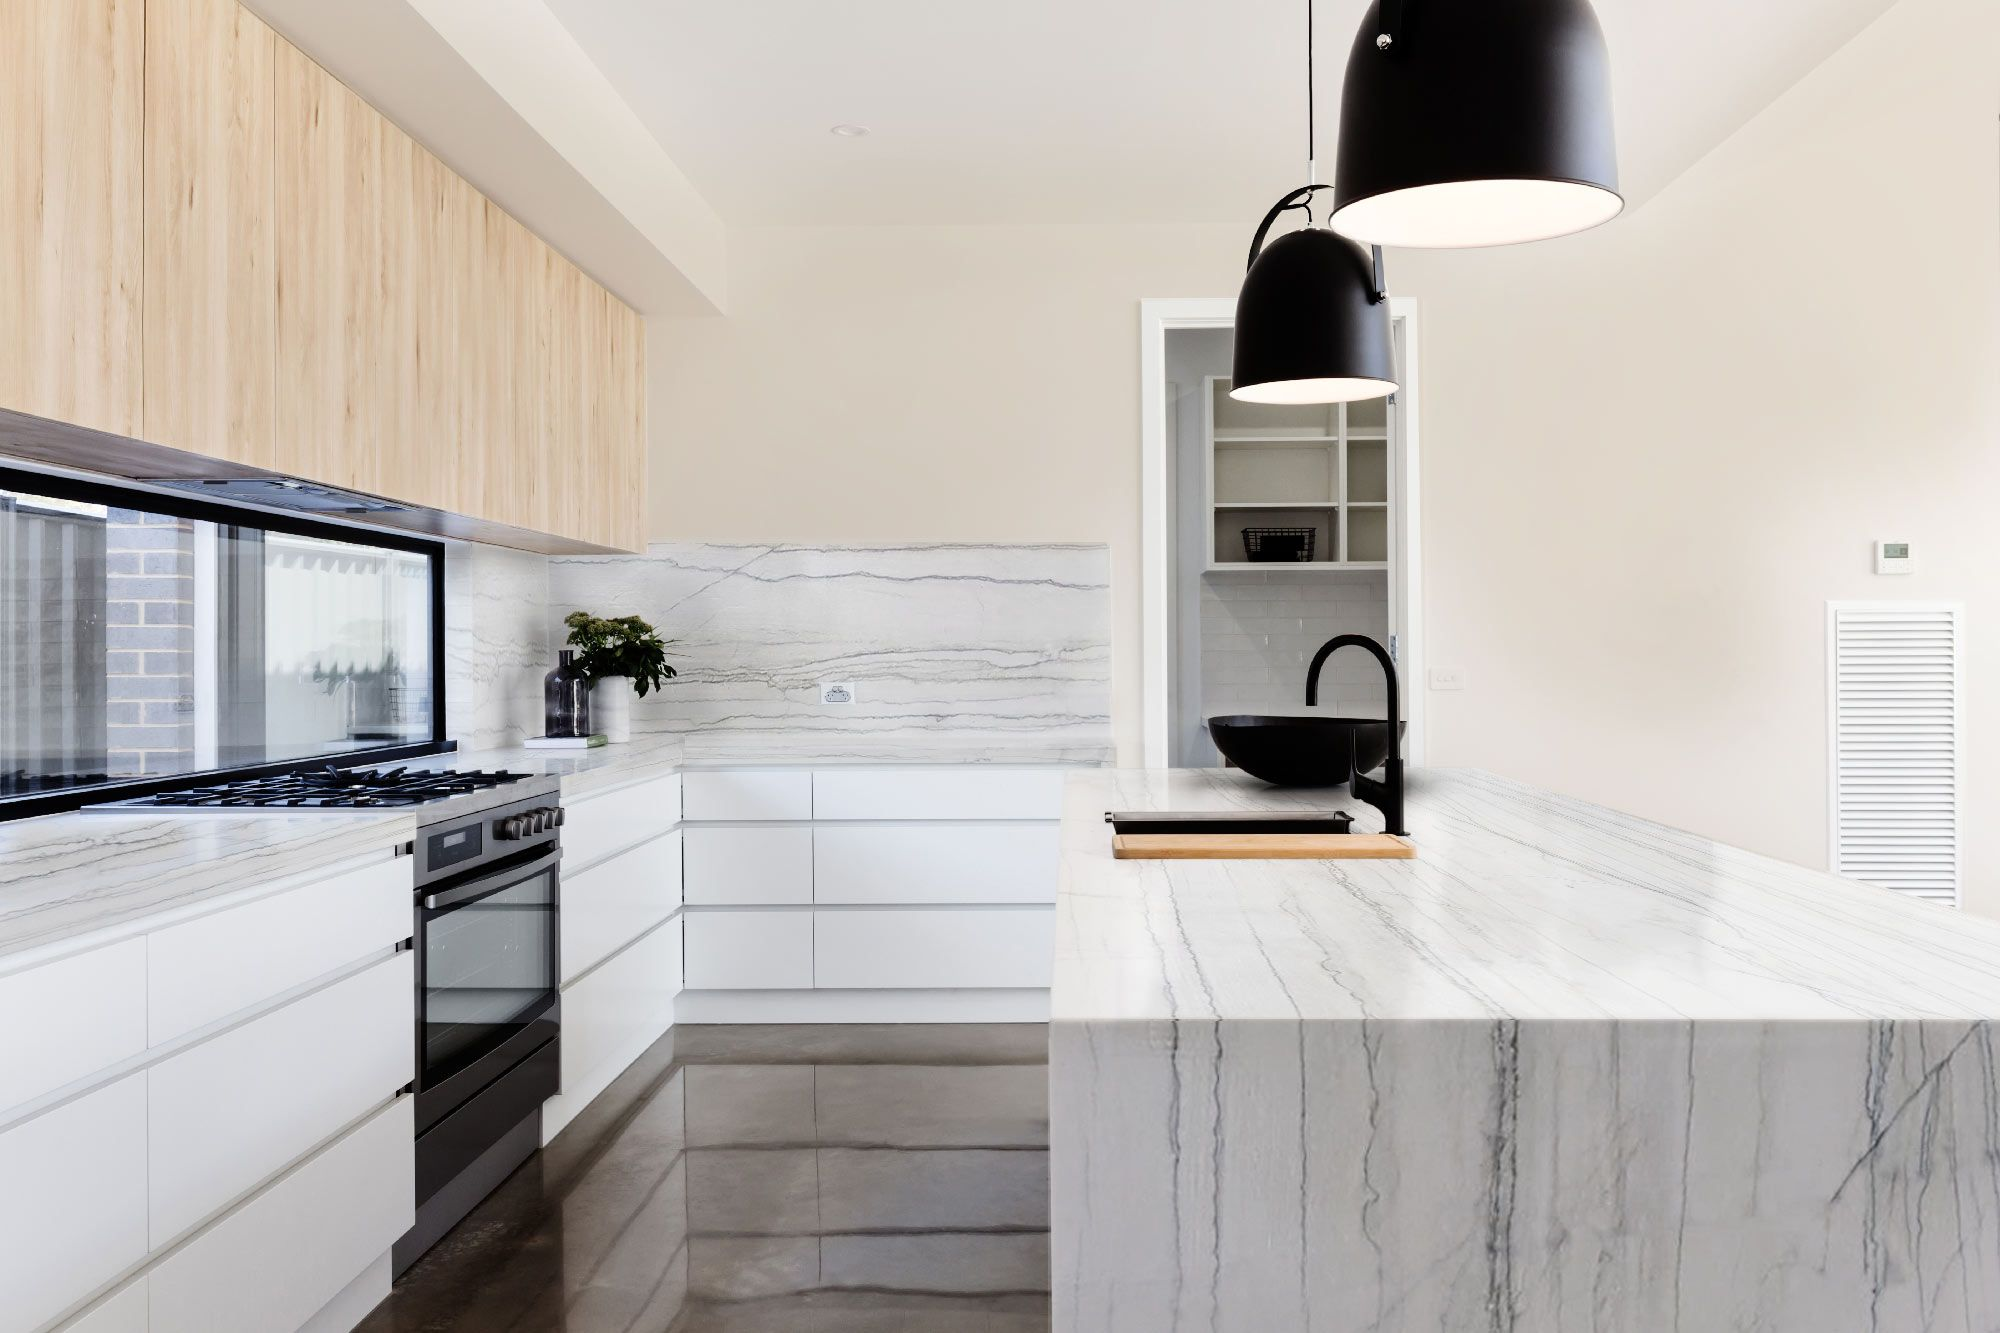 Top Piano Cucina.Piano Cucina In Quarzite White Macaubas Kitchen Top In